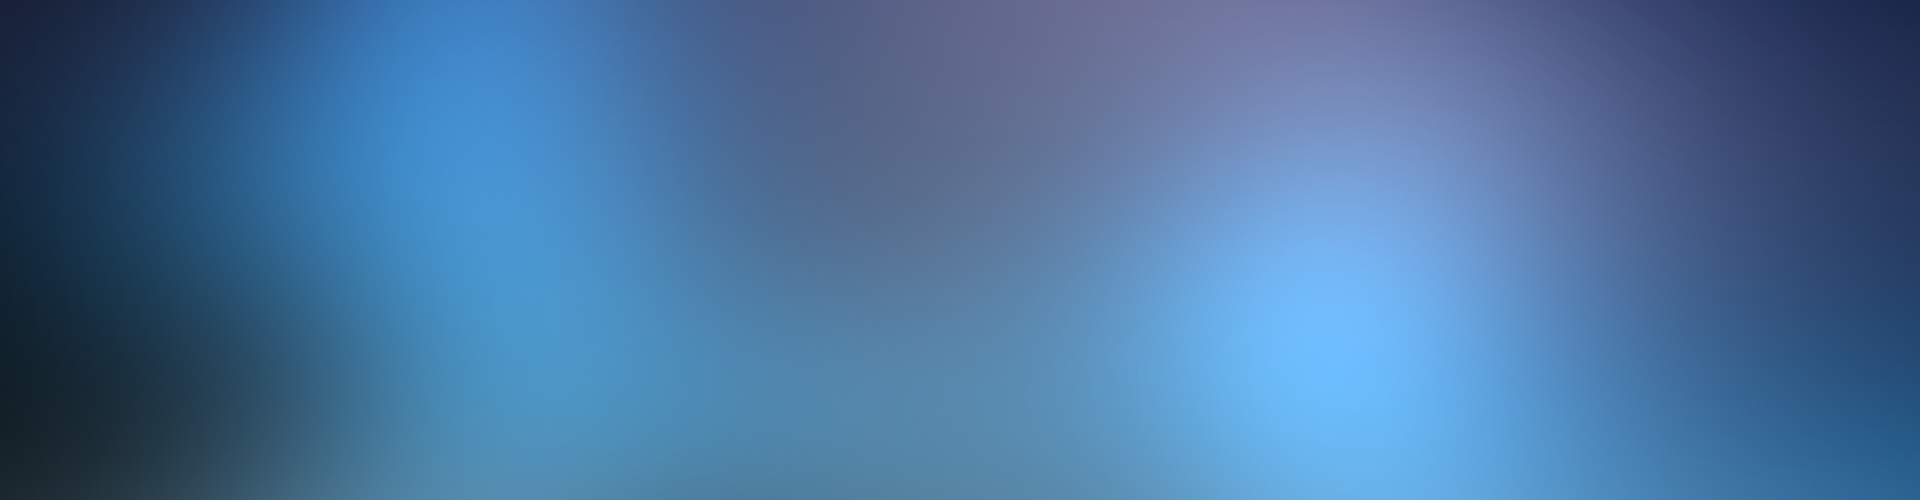 robots-light-blue-bg